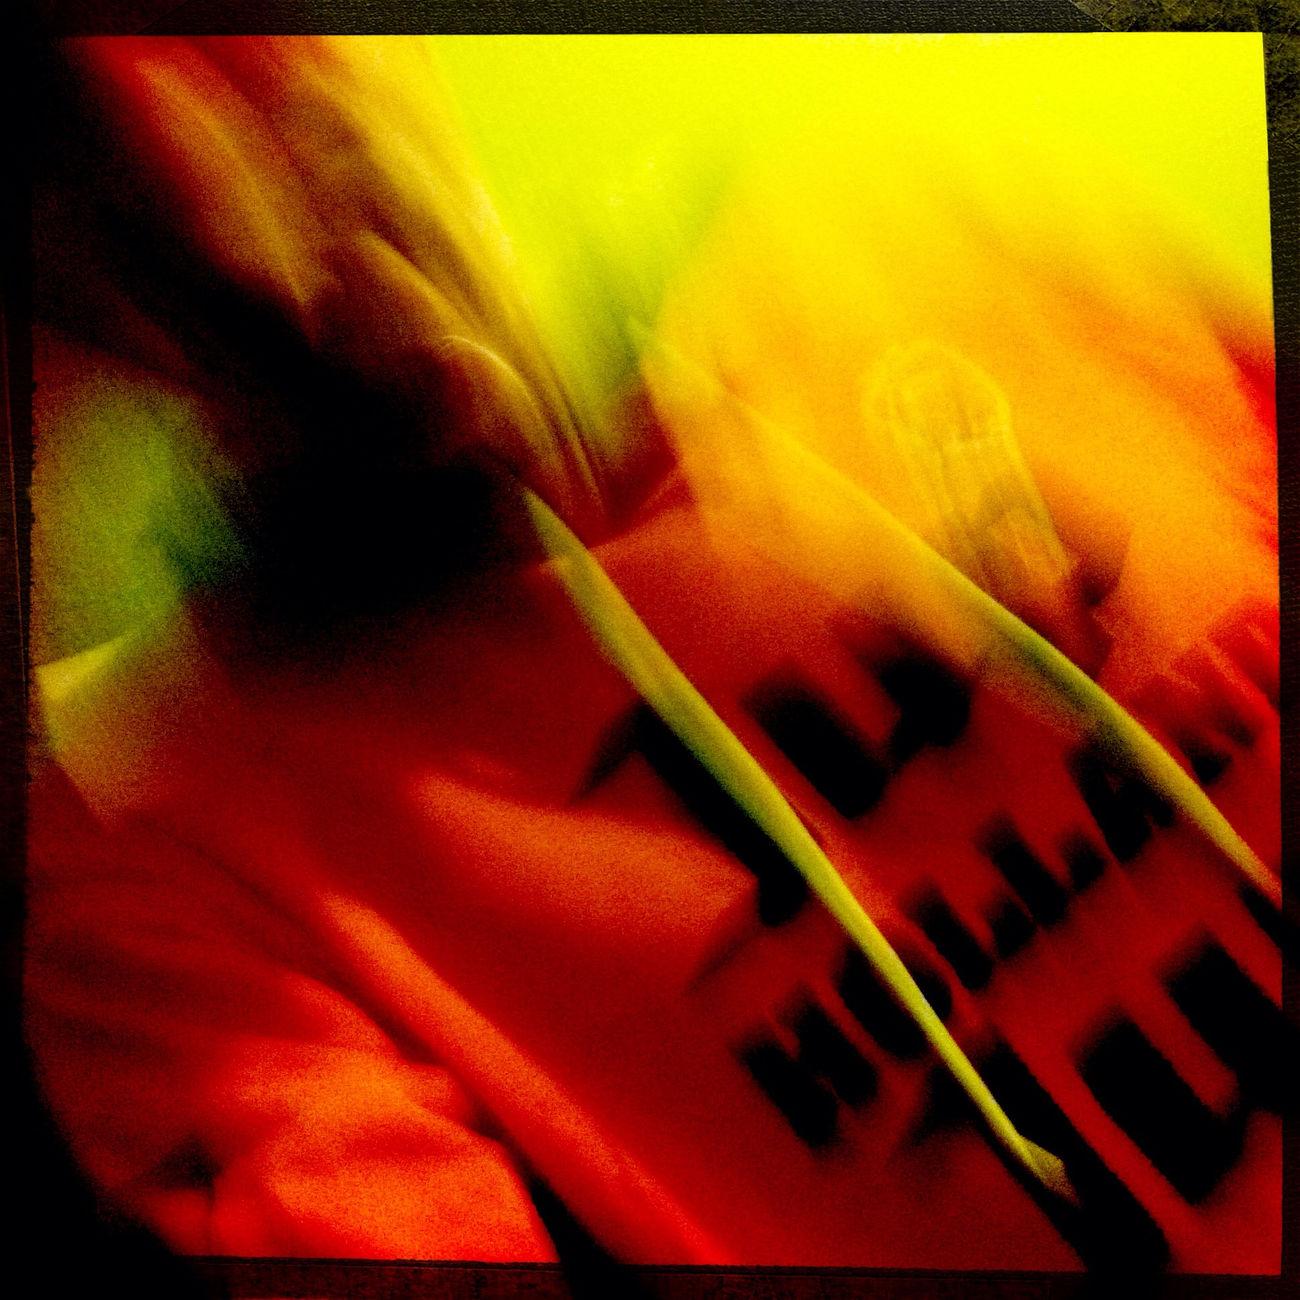 Self Portrait With Orange Shirt For Koniginnendag